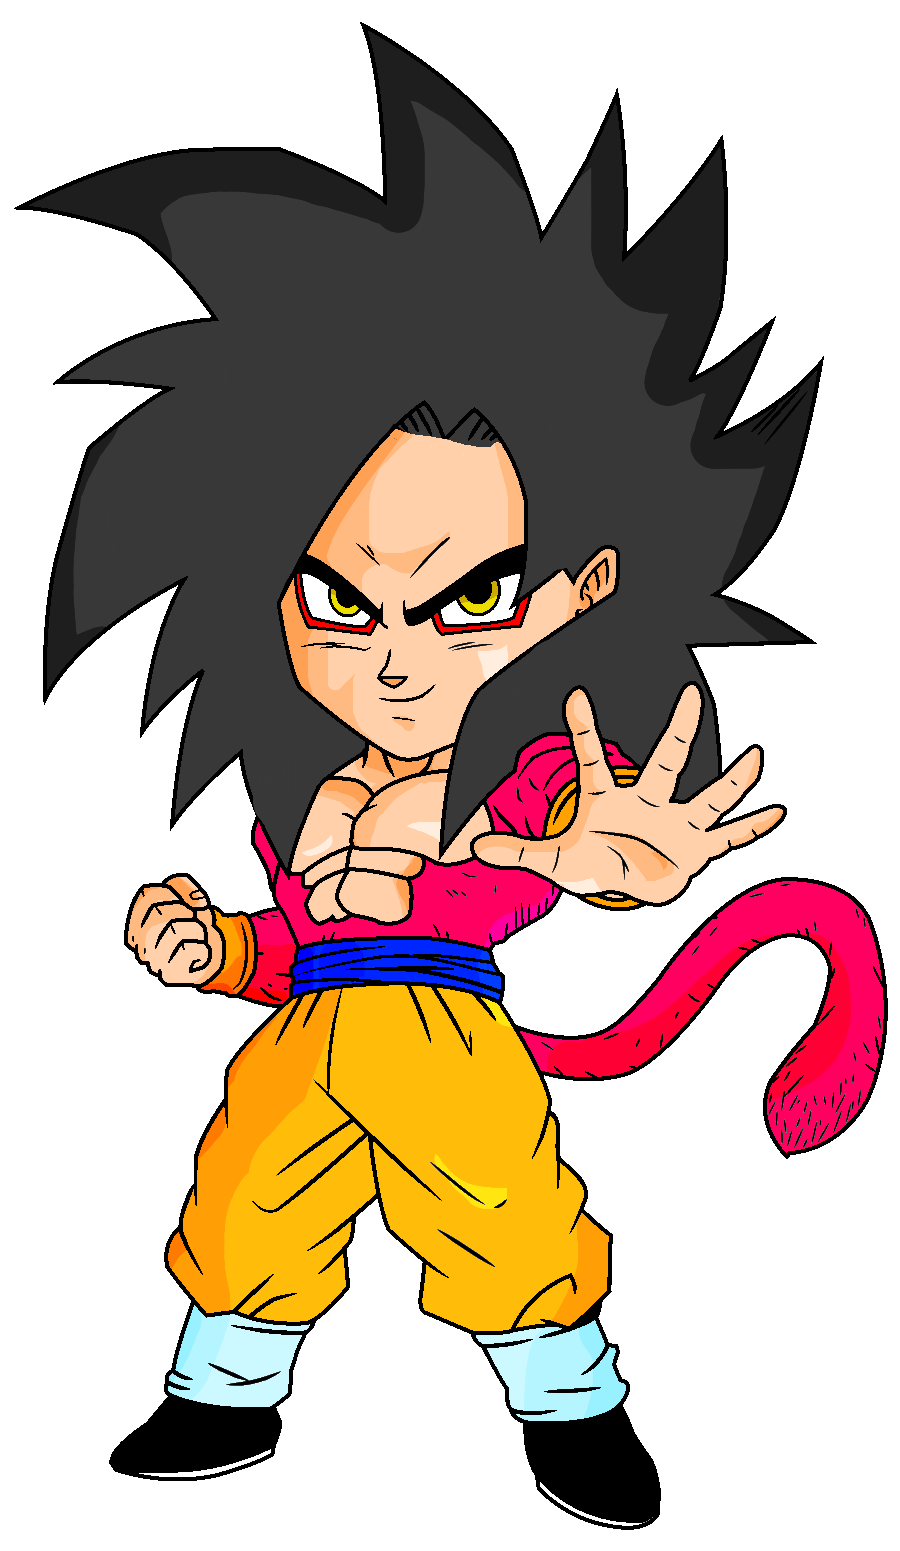 How To Draw Super Saiyan 6 Goku | Apps Directories